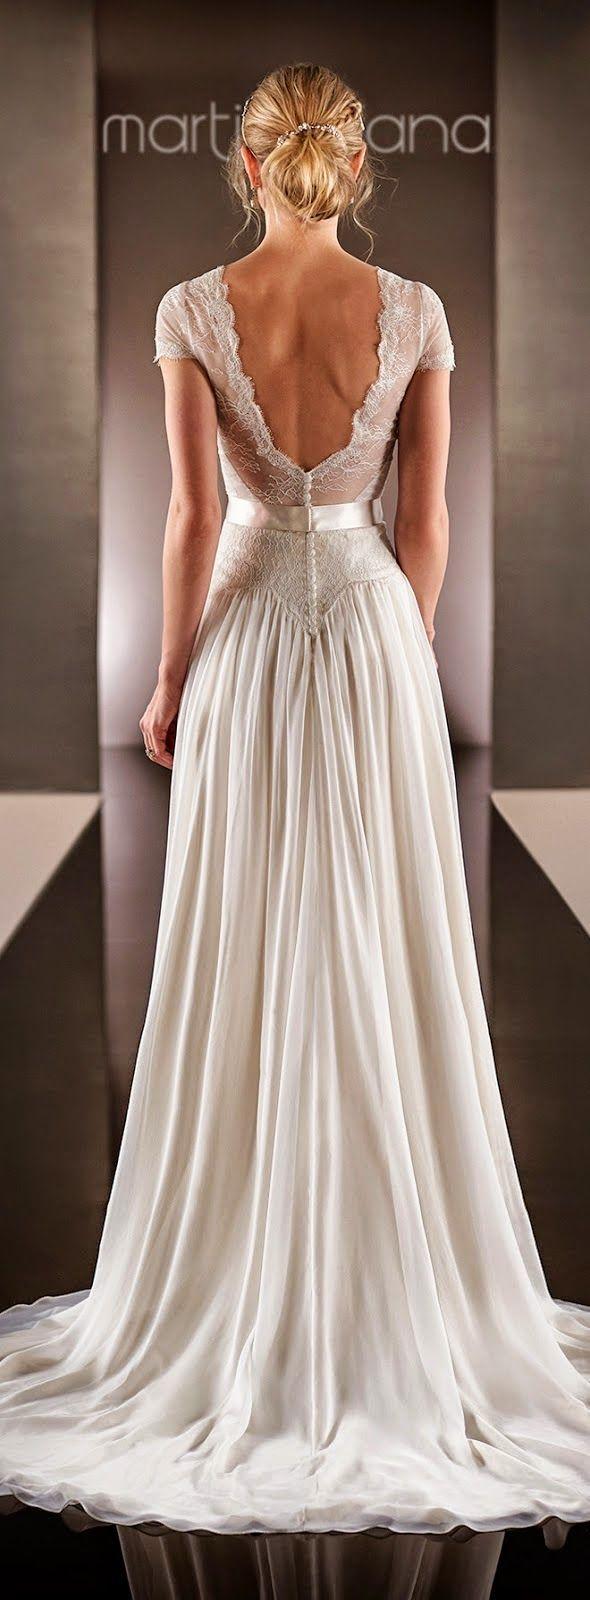 Flowy wedding dress with sleeves  Best Wedding Dresses of   Wedding dress Weddings and Wedding